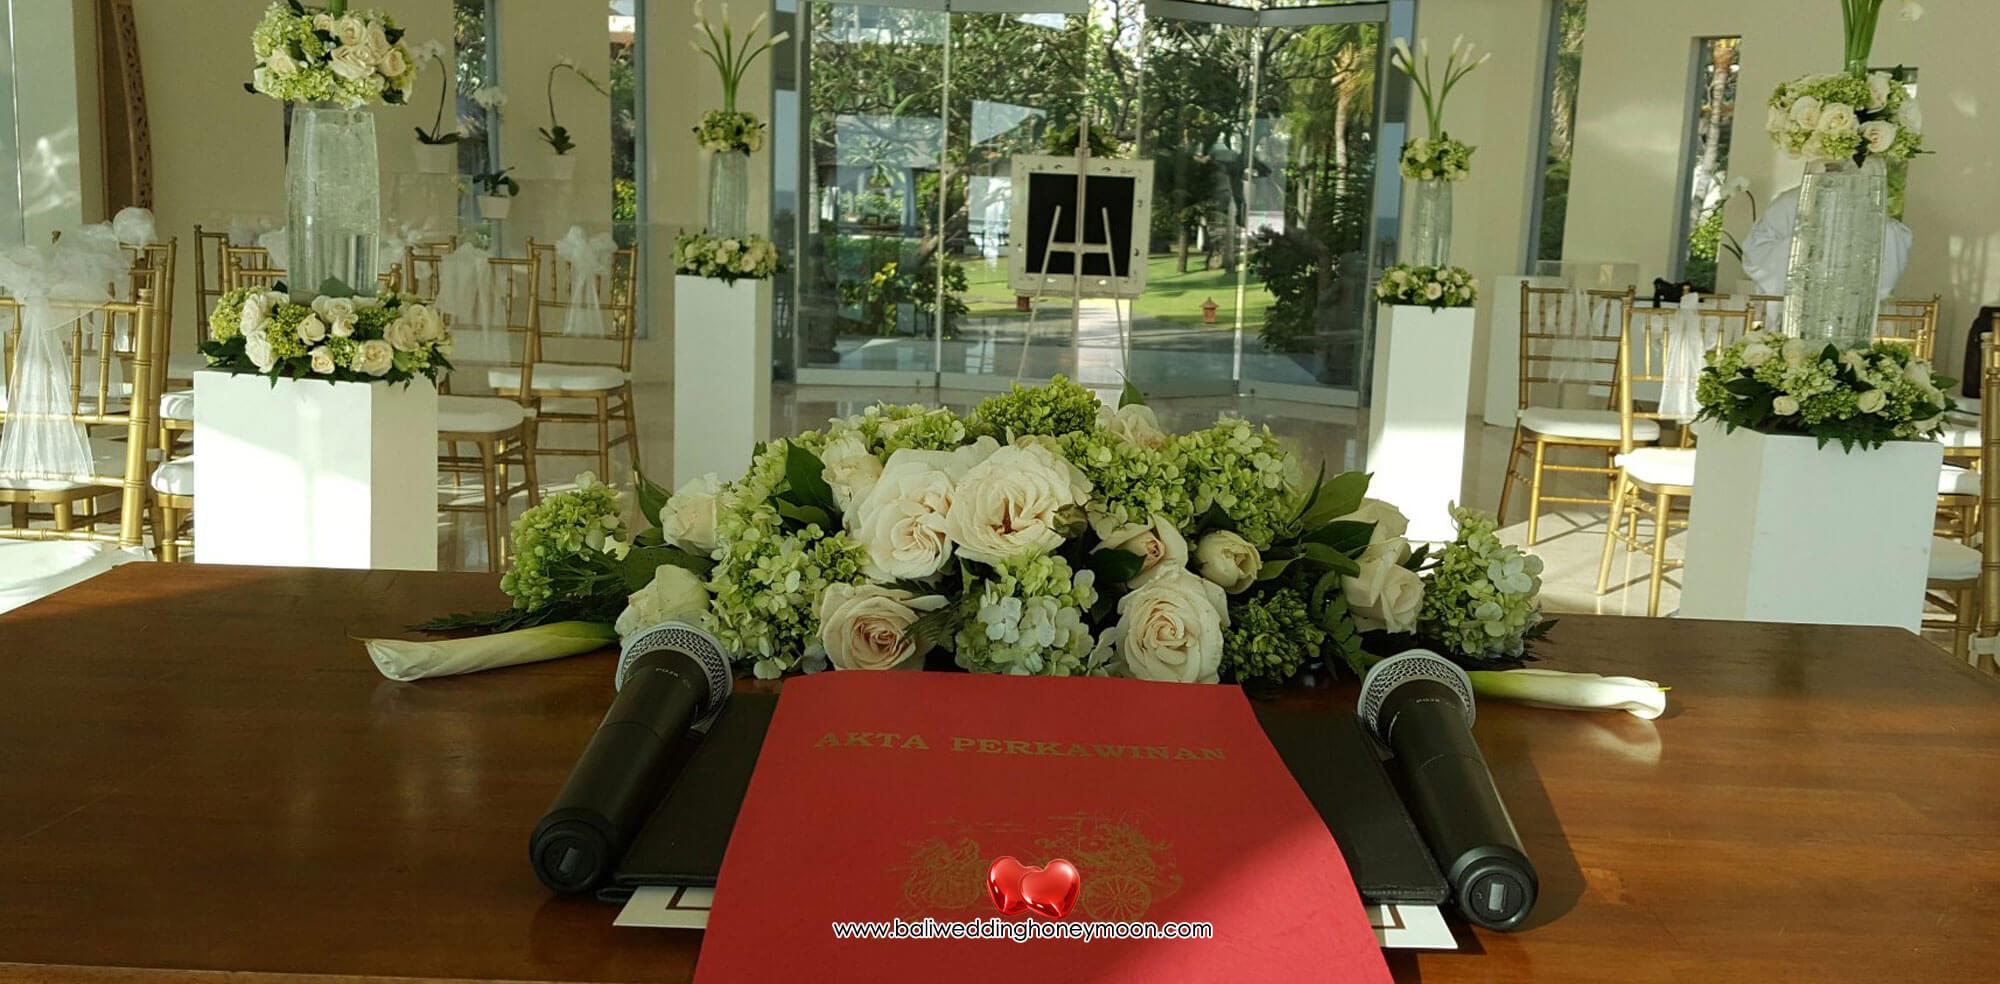 theseminyakpurnamabali-weddingvenuebali-baliwedding-baliweddinghoneymoon-baliweddingorganizer-baliweddingplanner-baliweddingpackage7